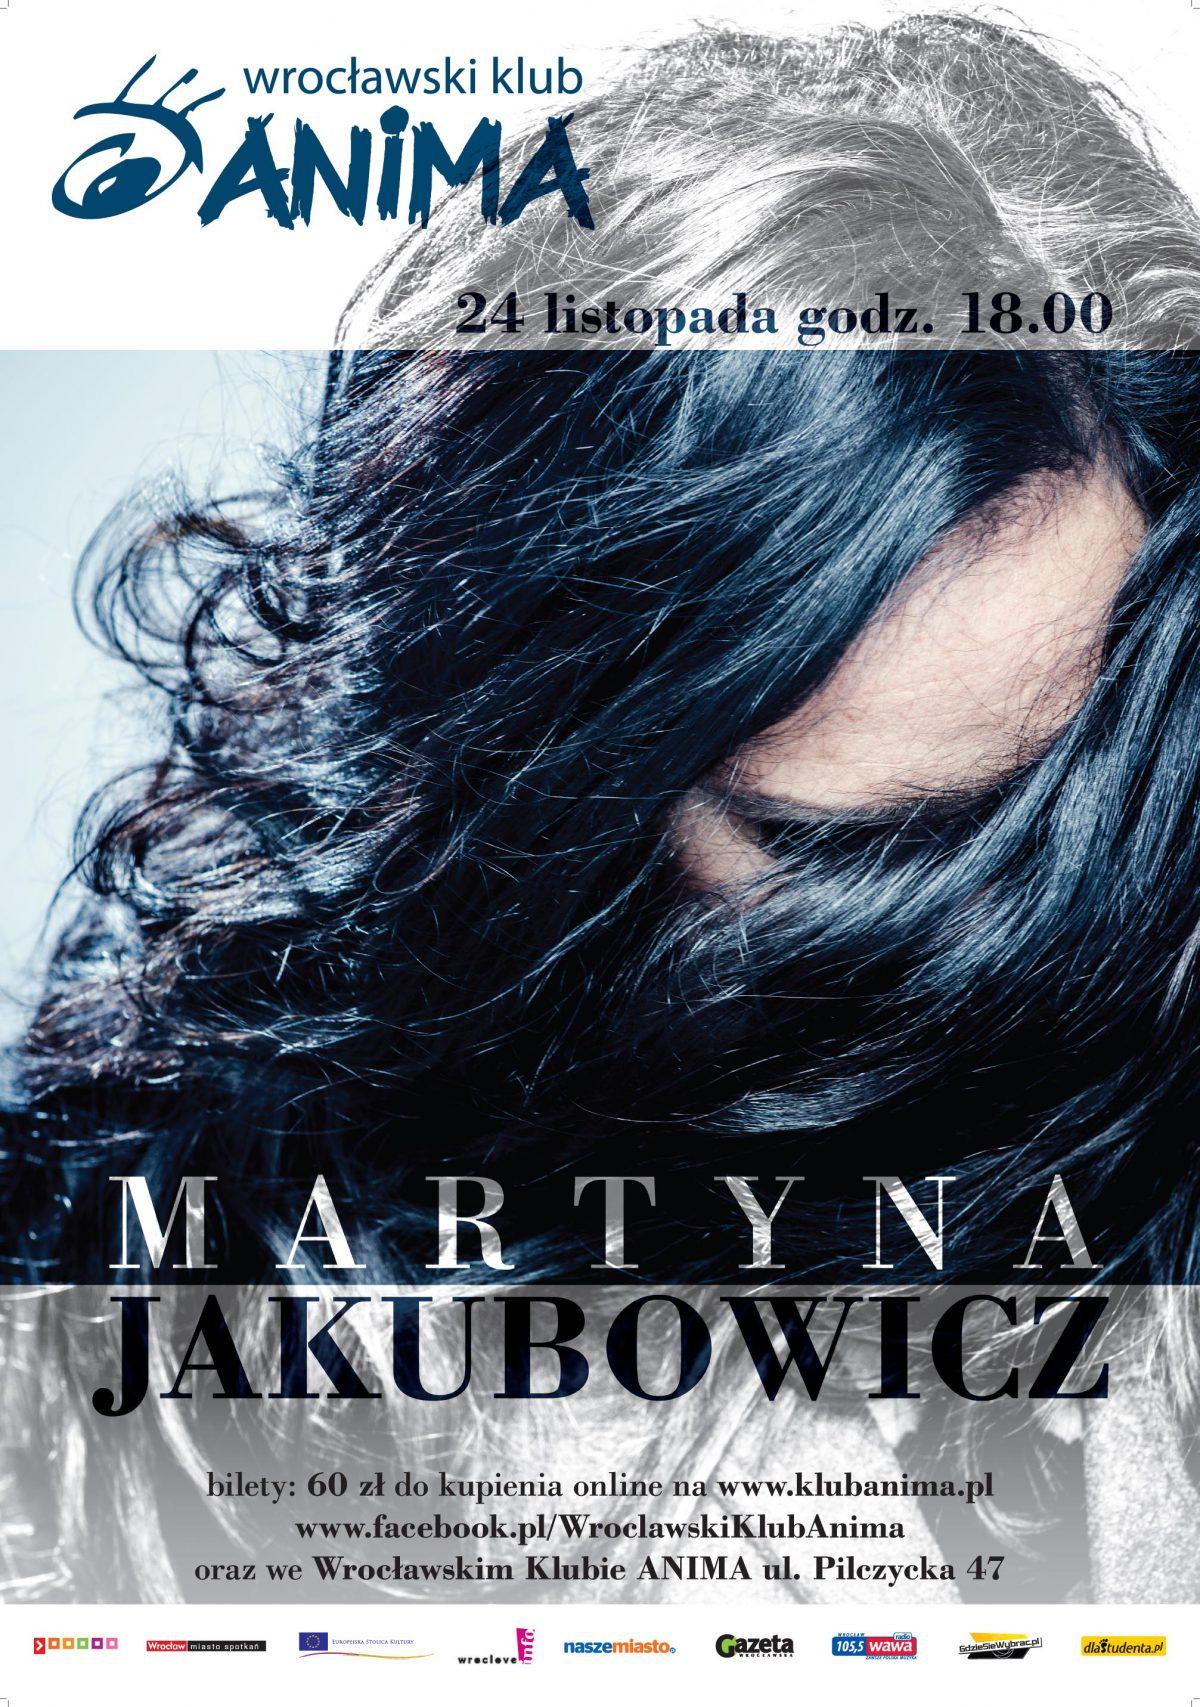 Martyna Jakubowicz